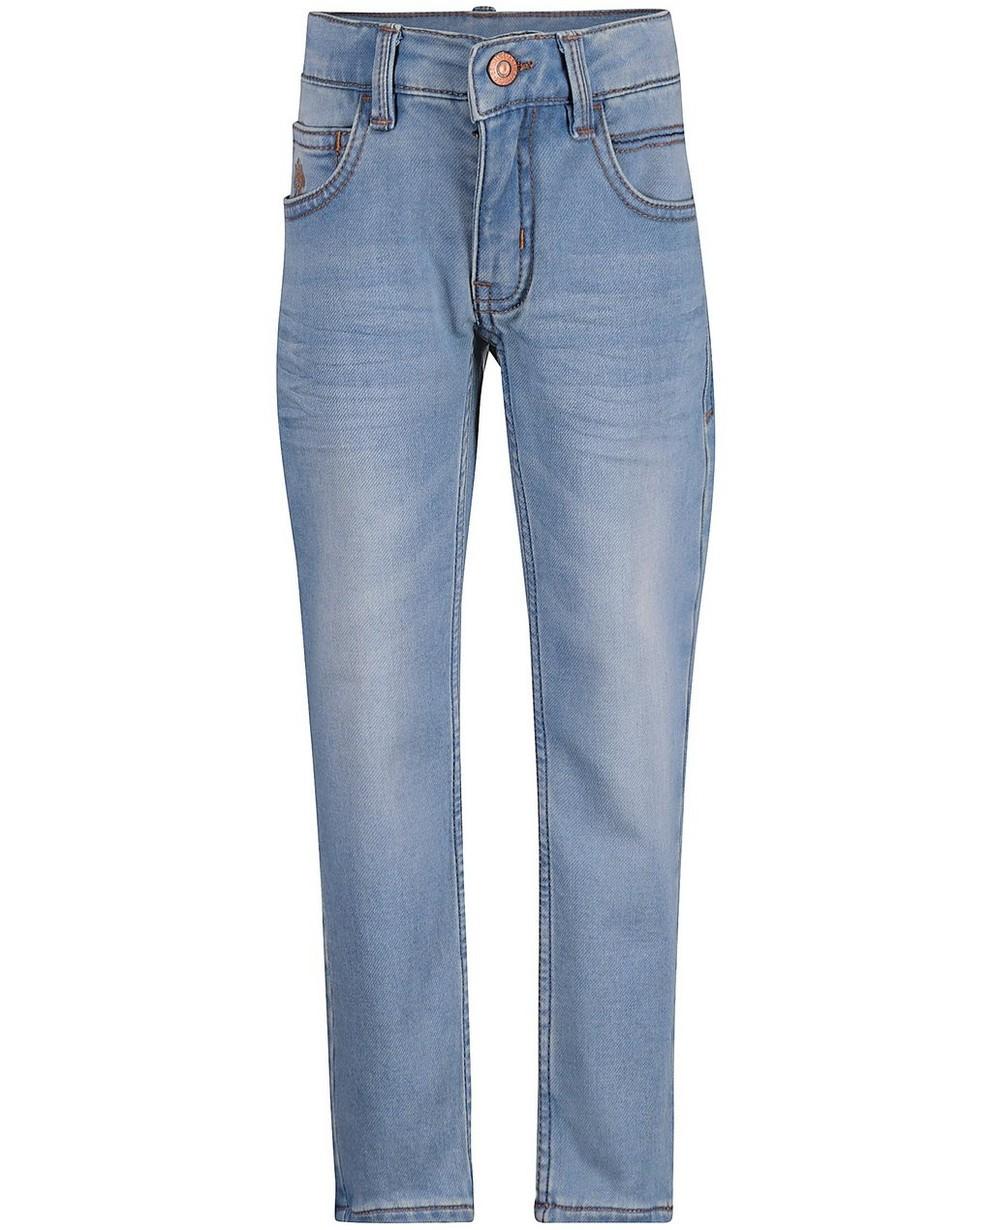 Jeans slim bleu clair SIMON - sweat denim - JBC